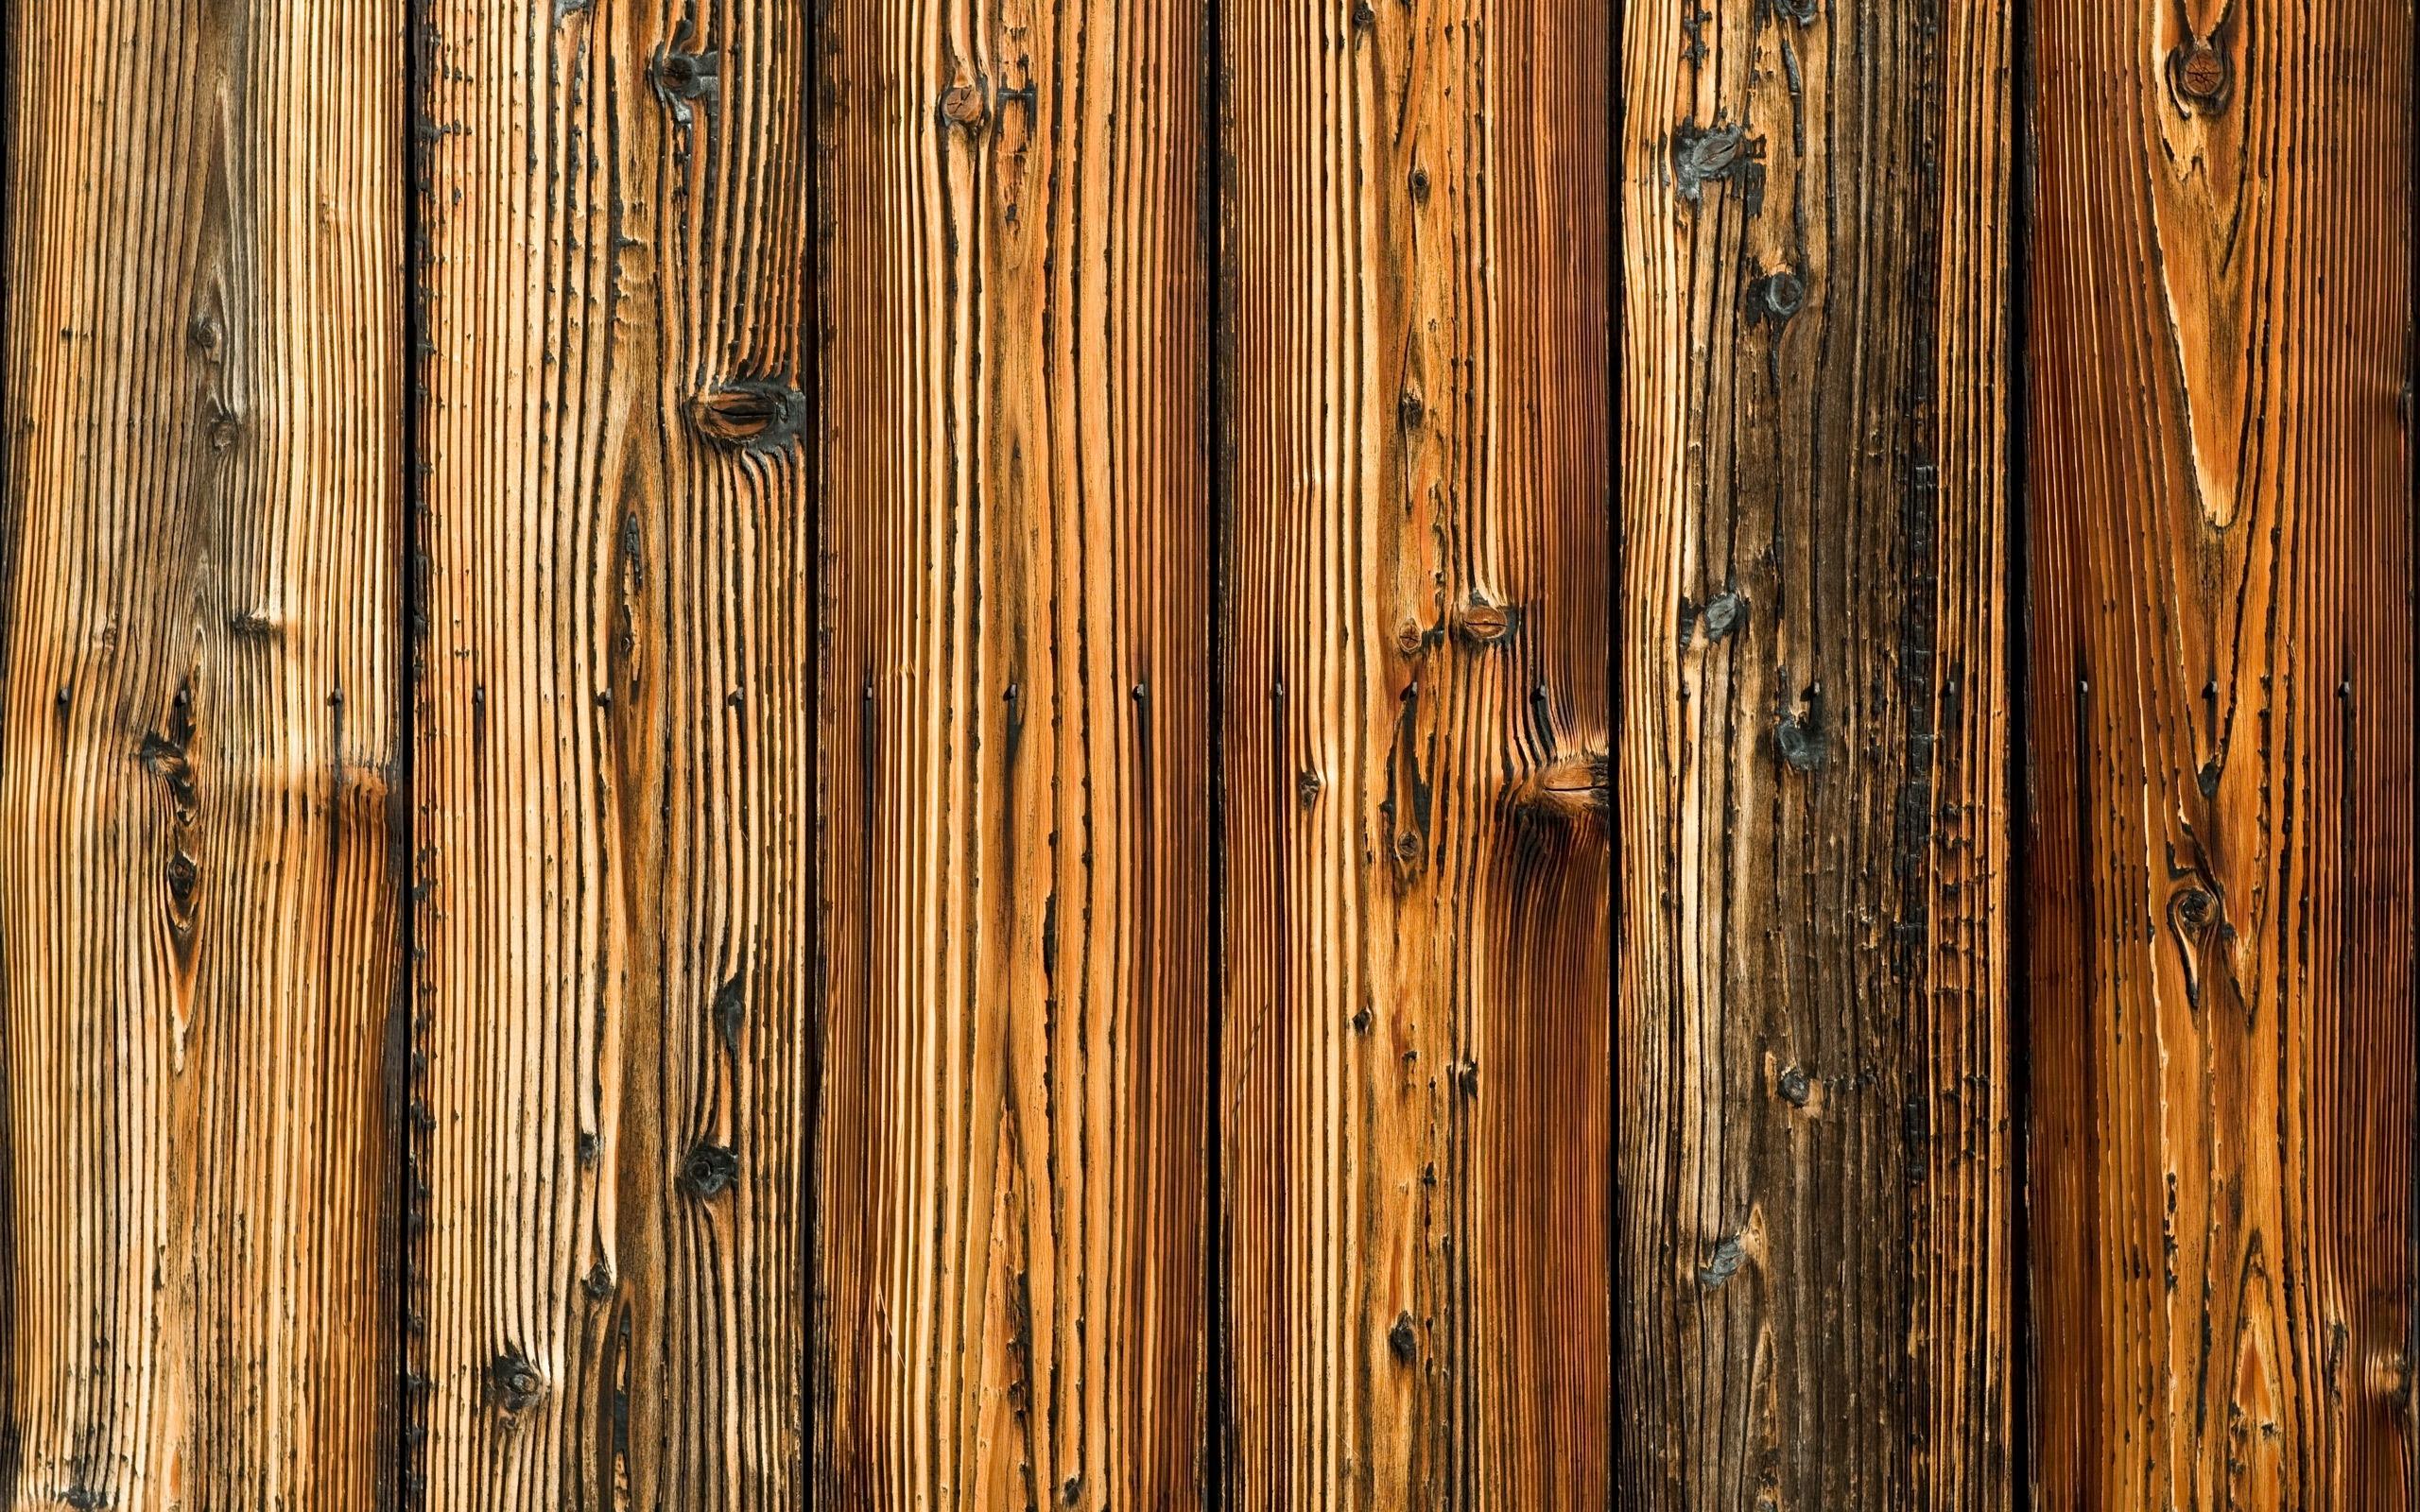 Textures Wood Board Wallpaper 2560x1600 Full HD Wallpapers 2560x1600